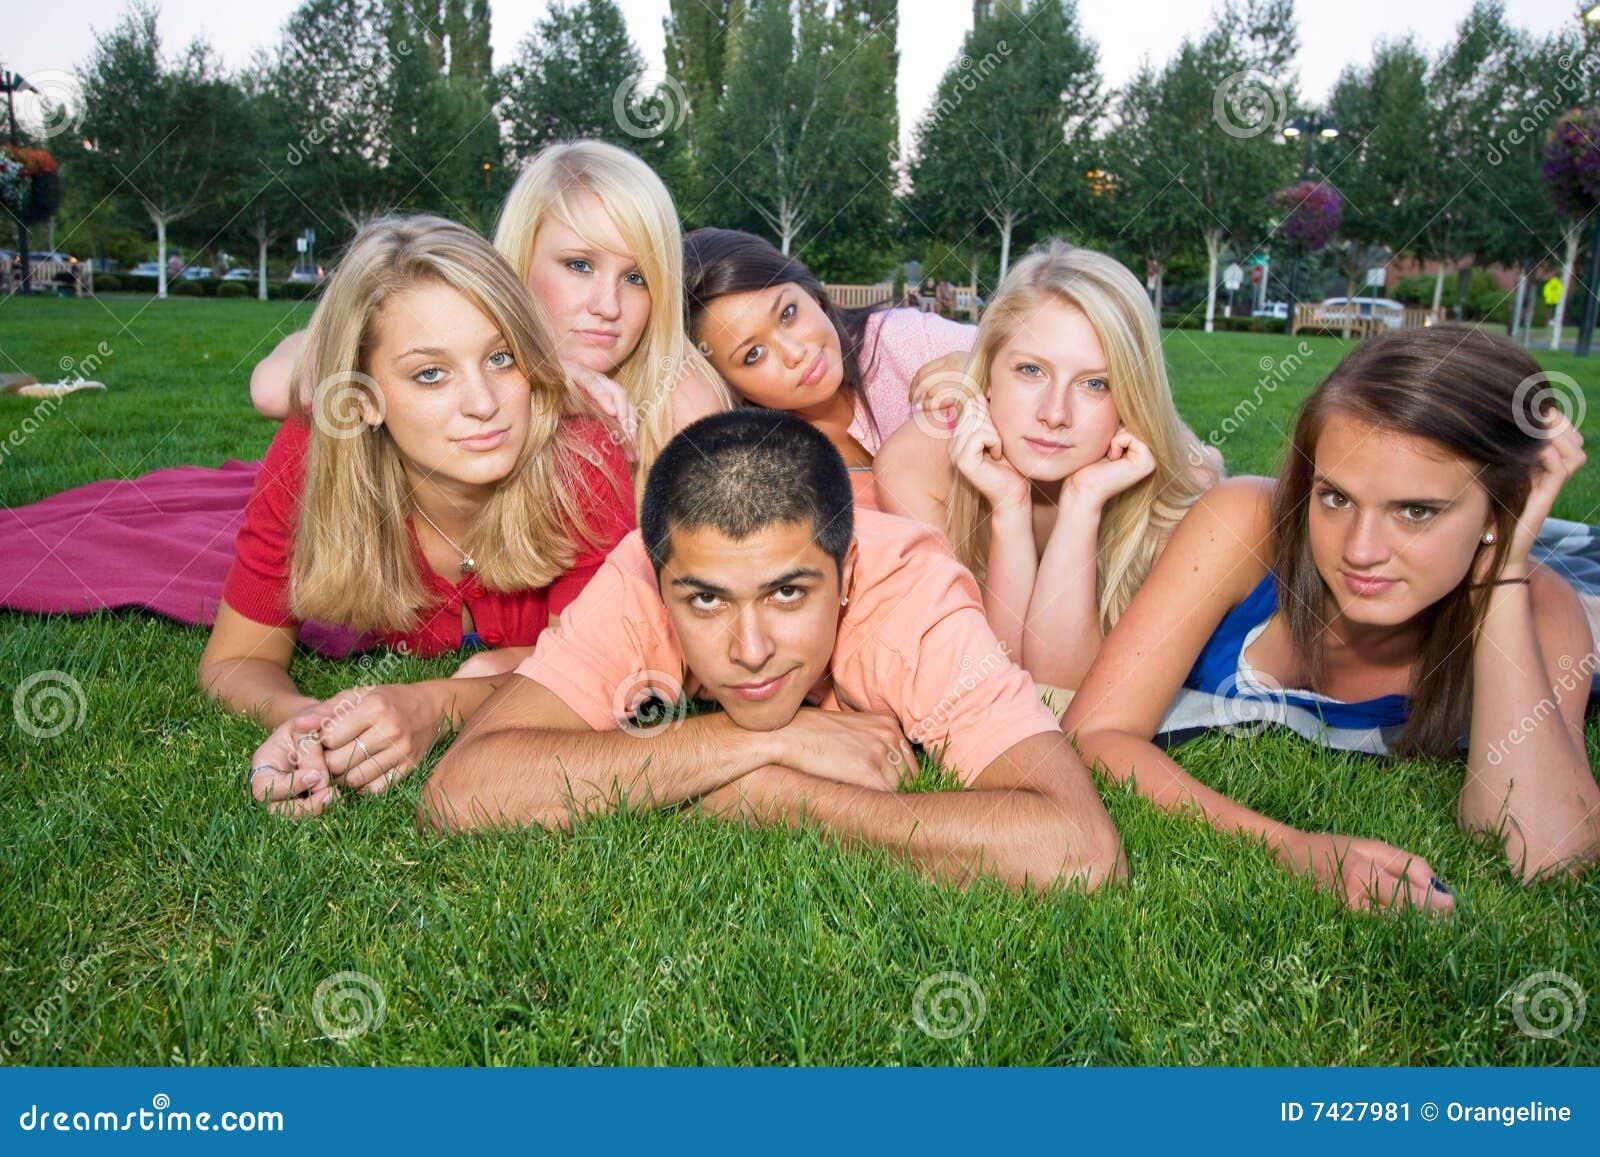 Five Girl One Boy